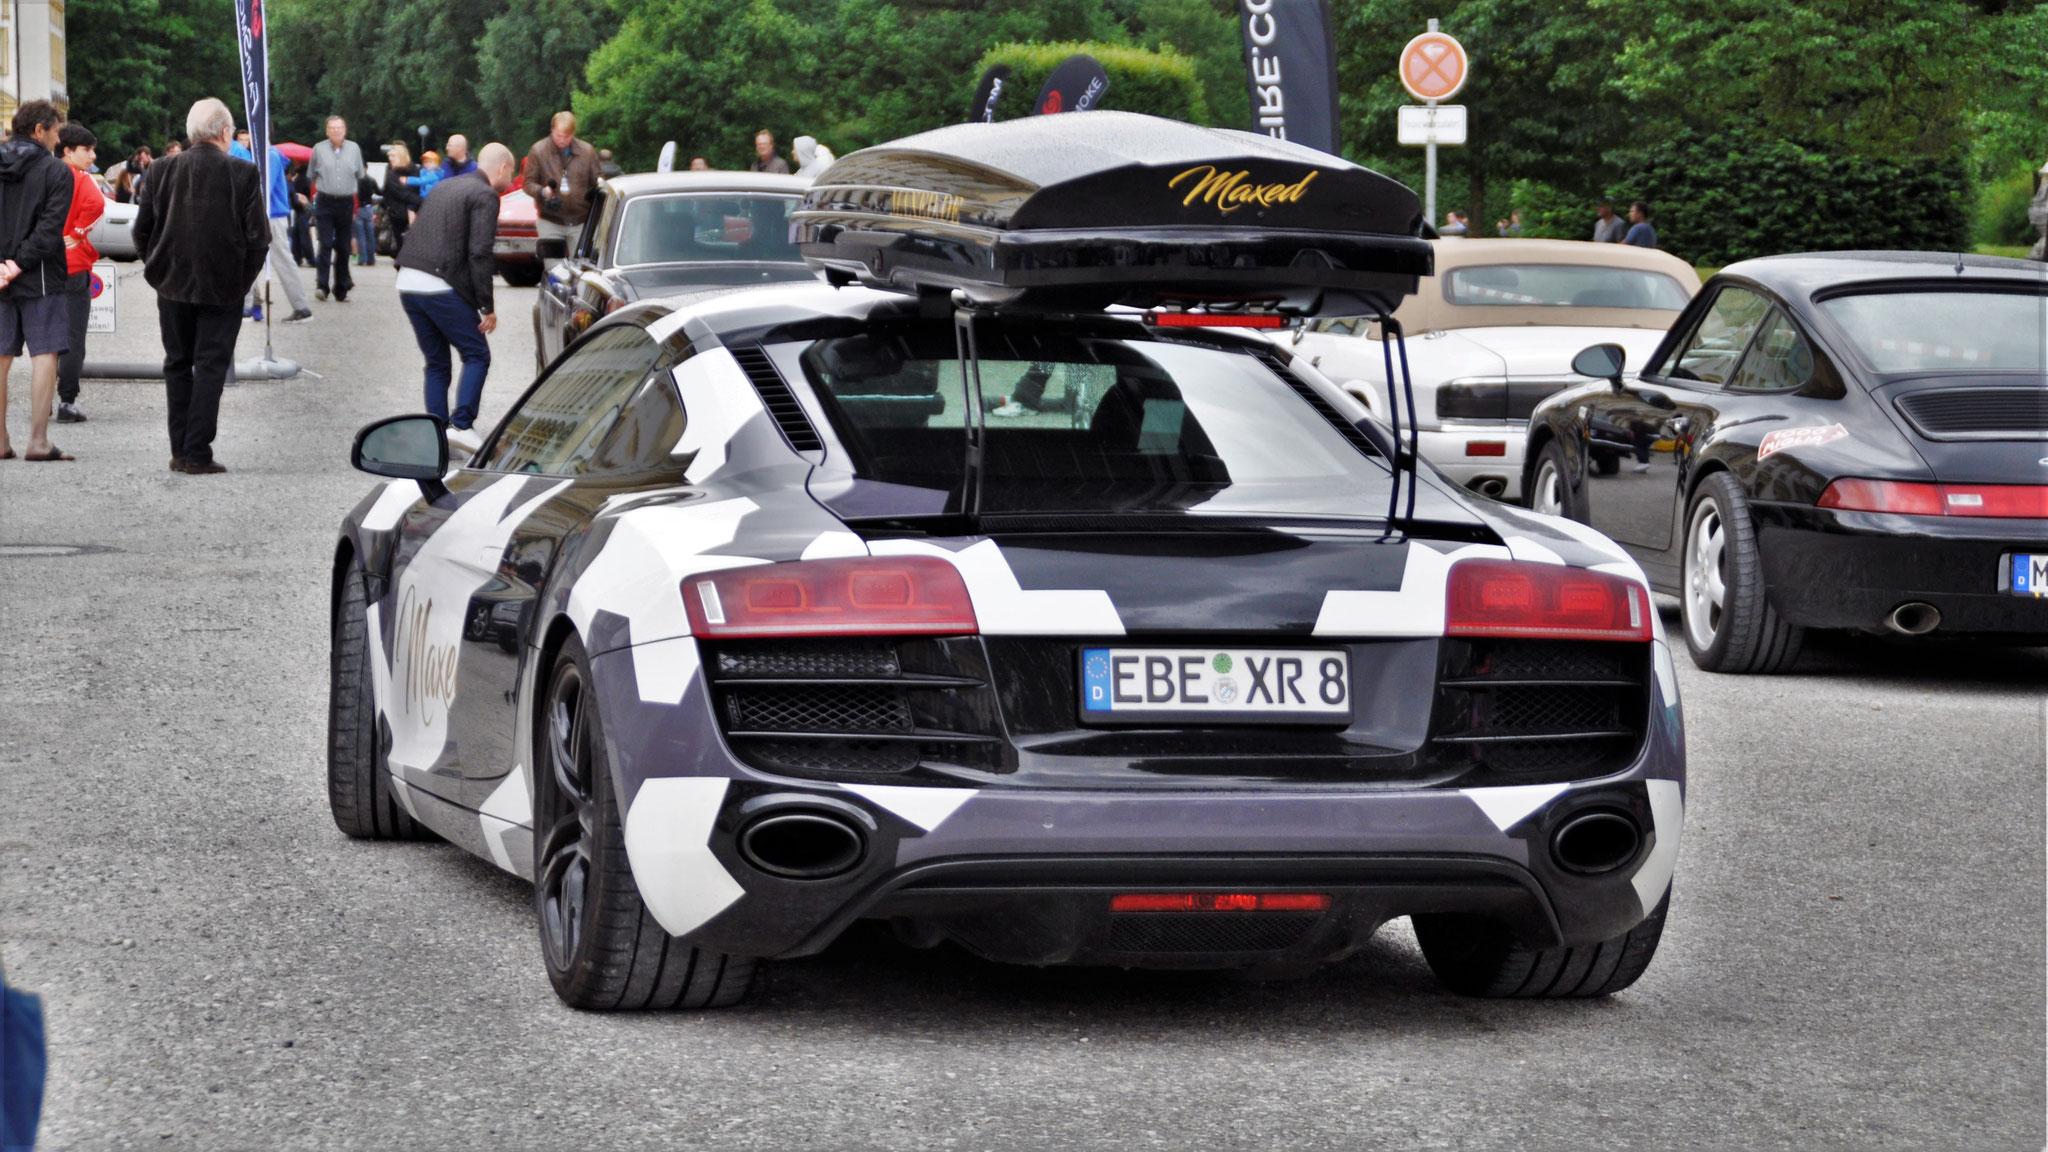 Audi R8 - EBE-XR-8